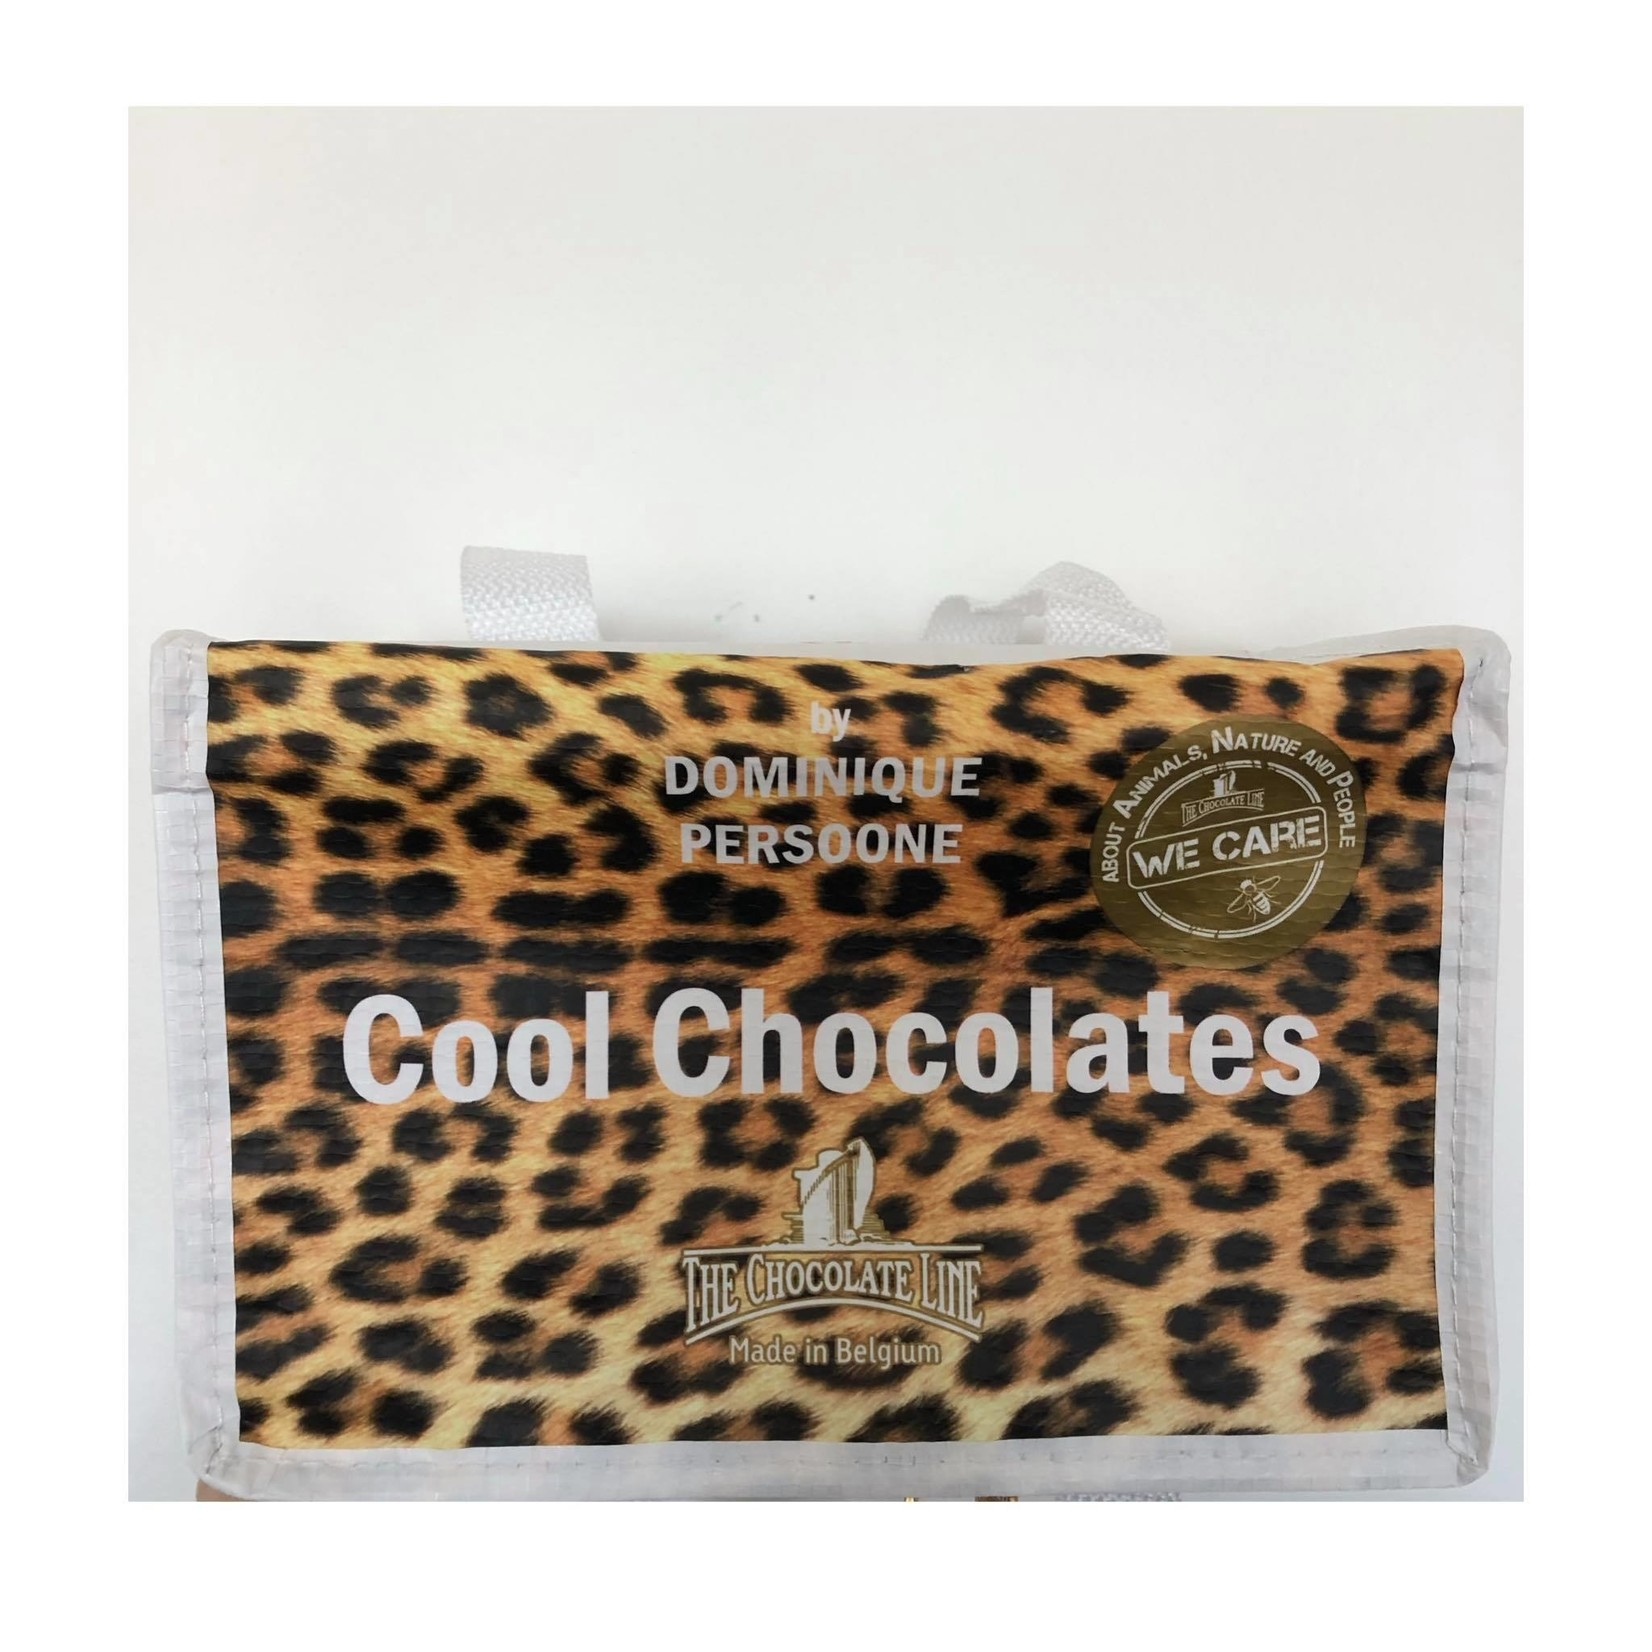 Isobag The Chocolate Line